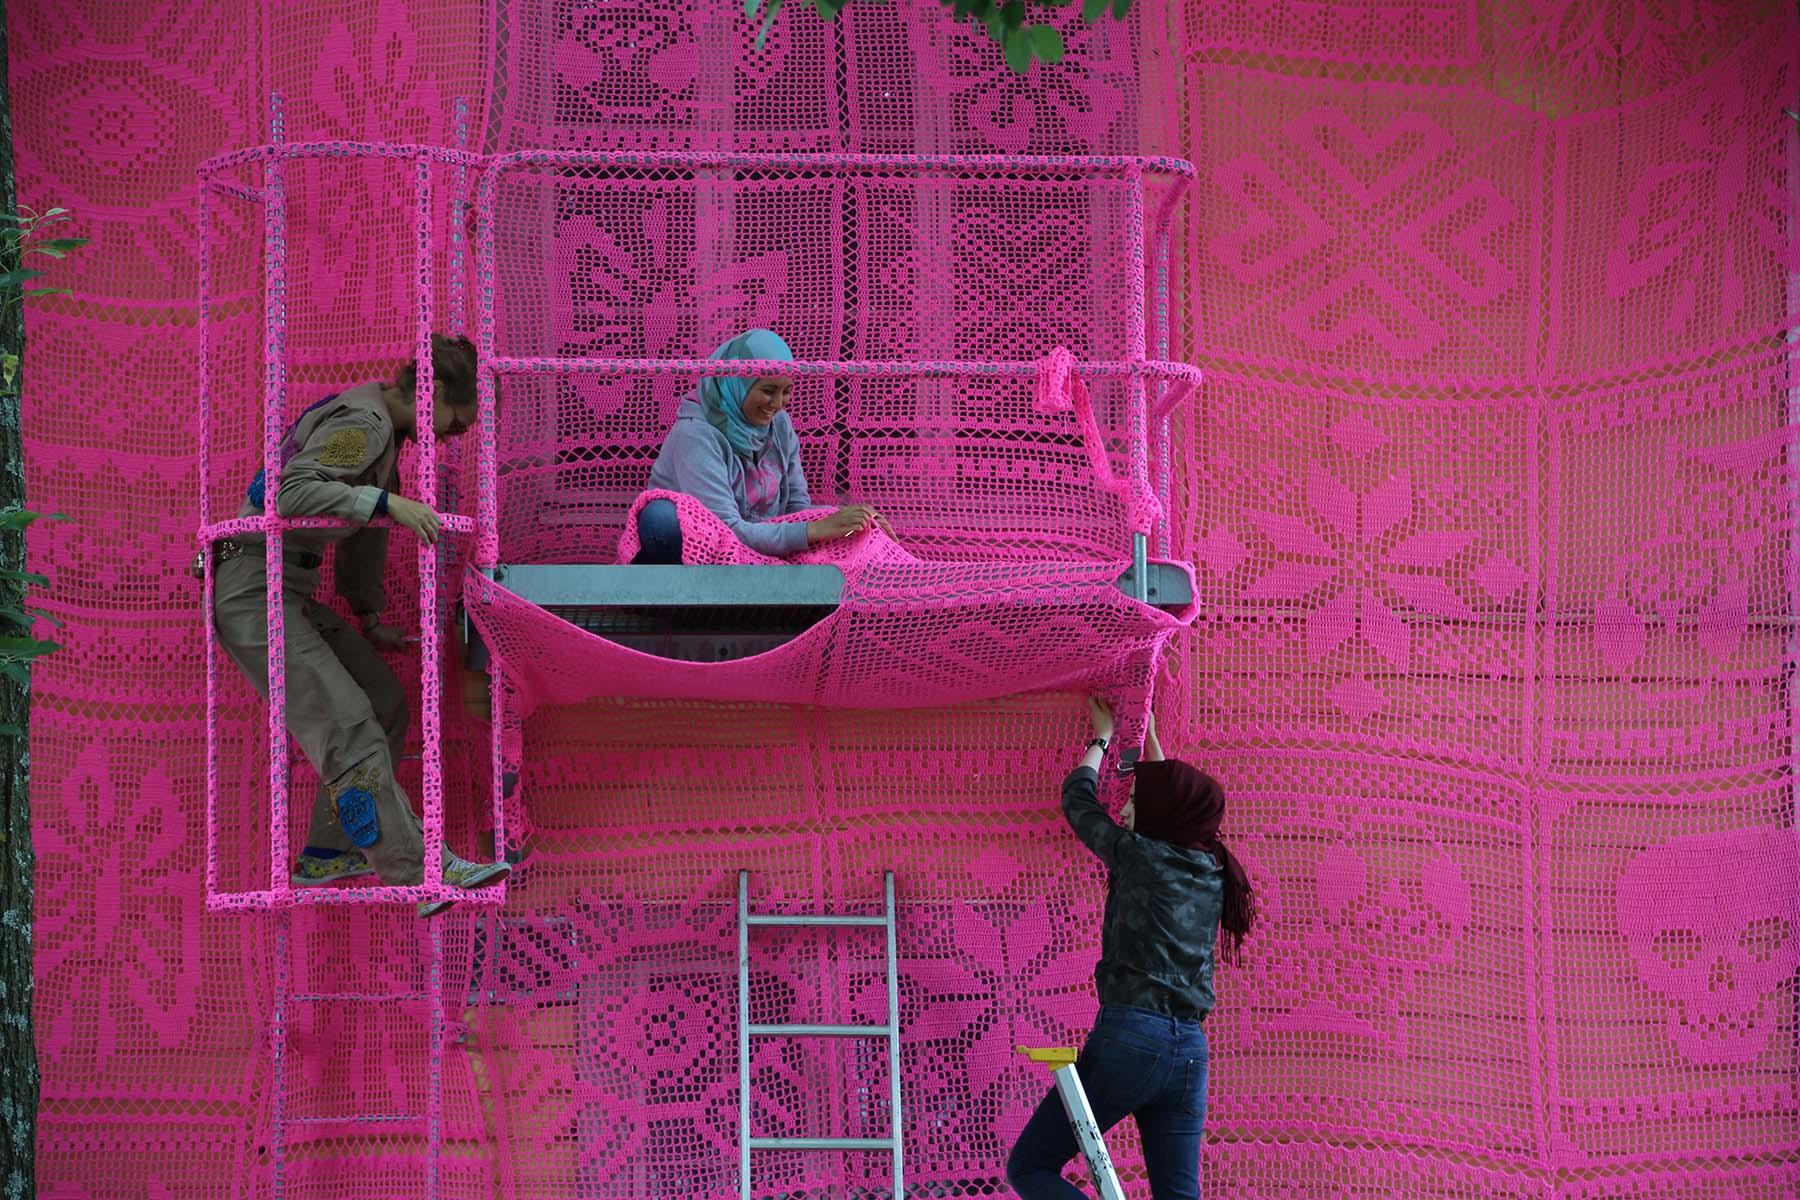 alfred einstein pink house, crochet, craft, american art museum, wall street bull, brooklyn bridge